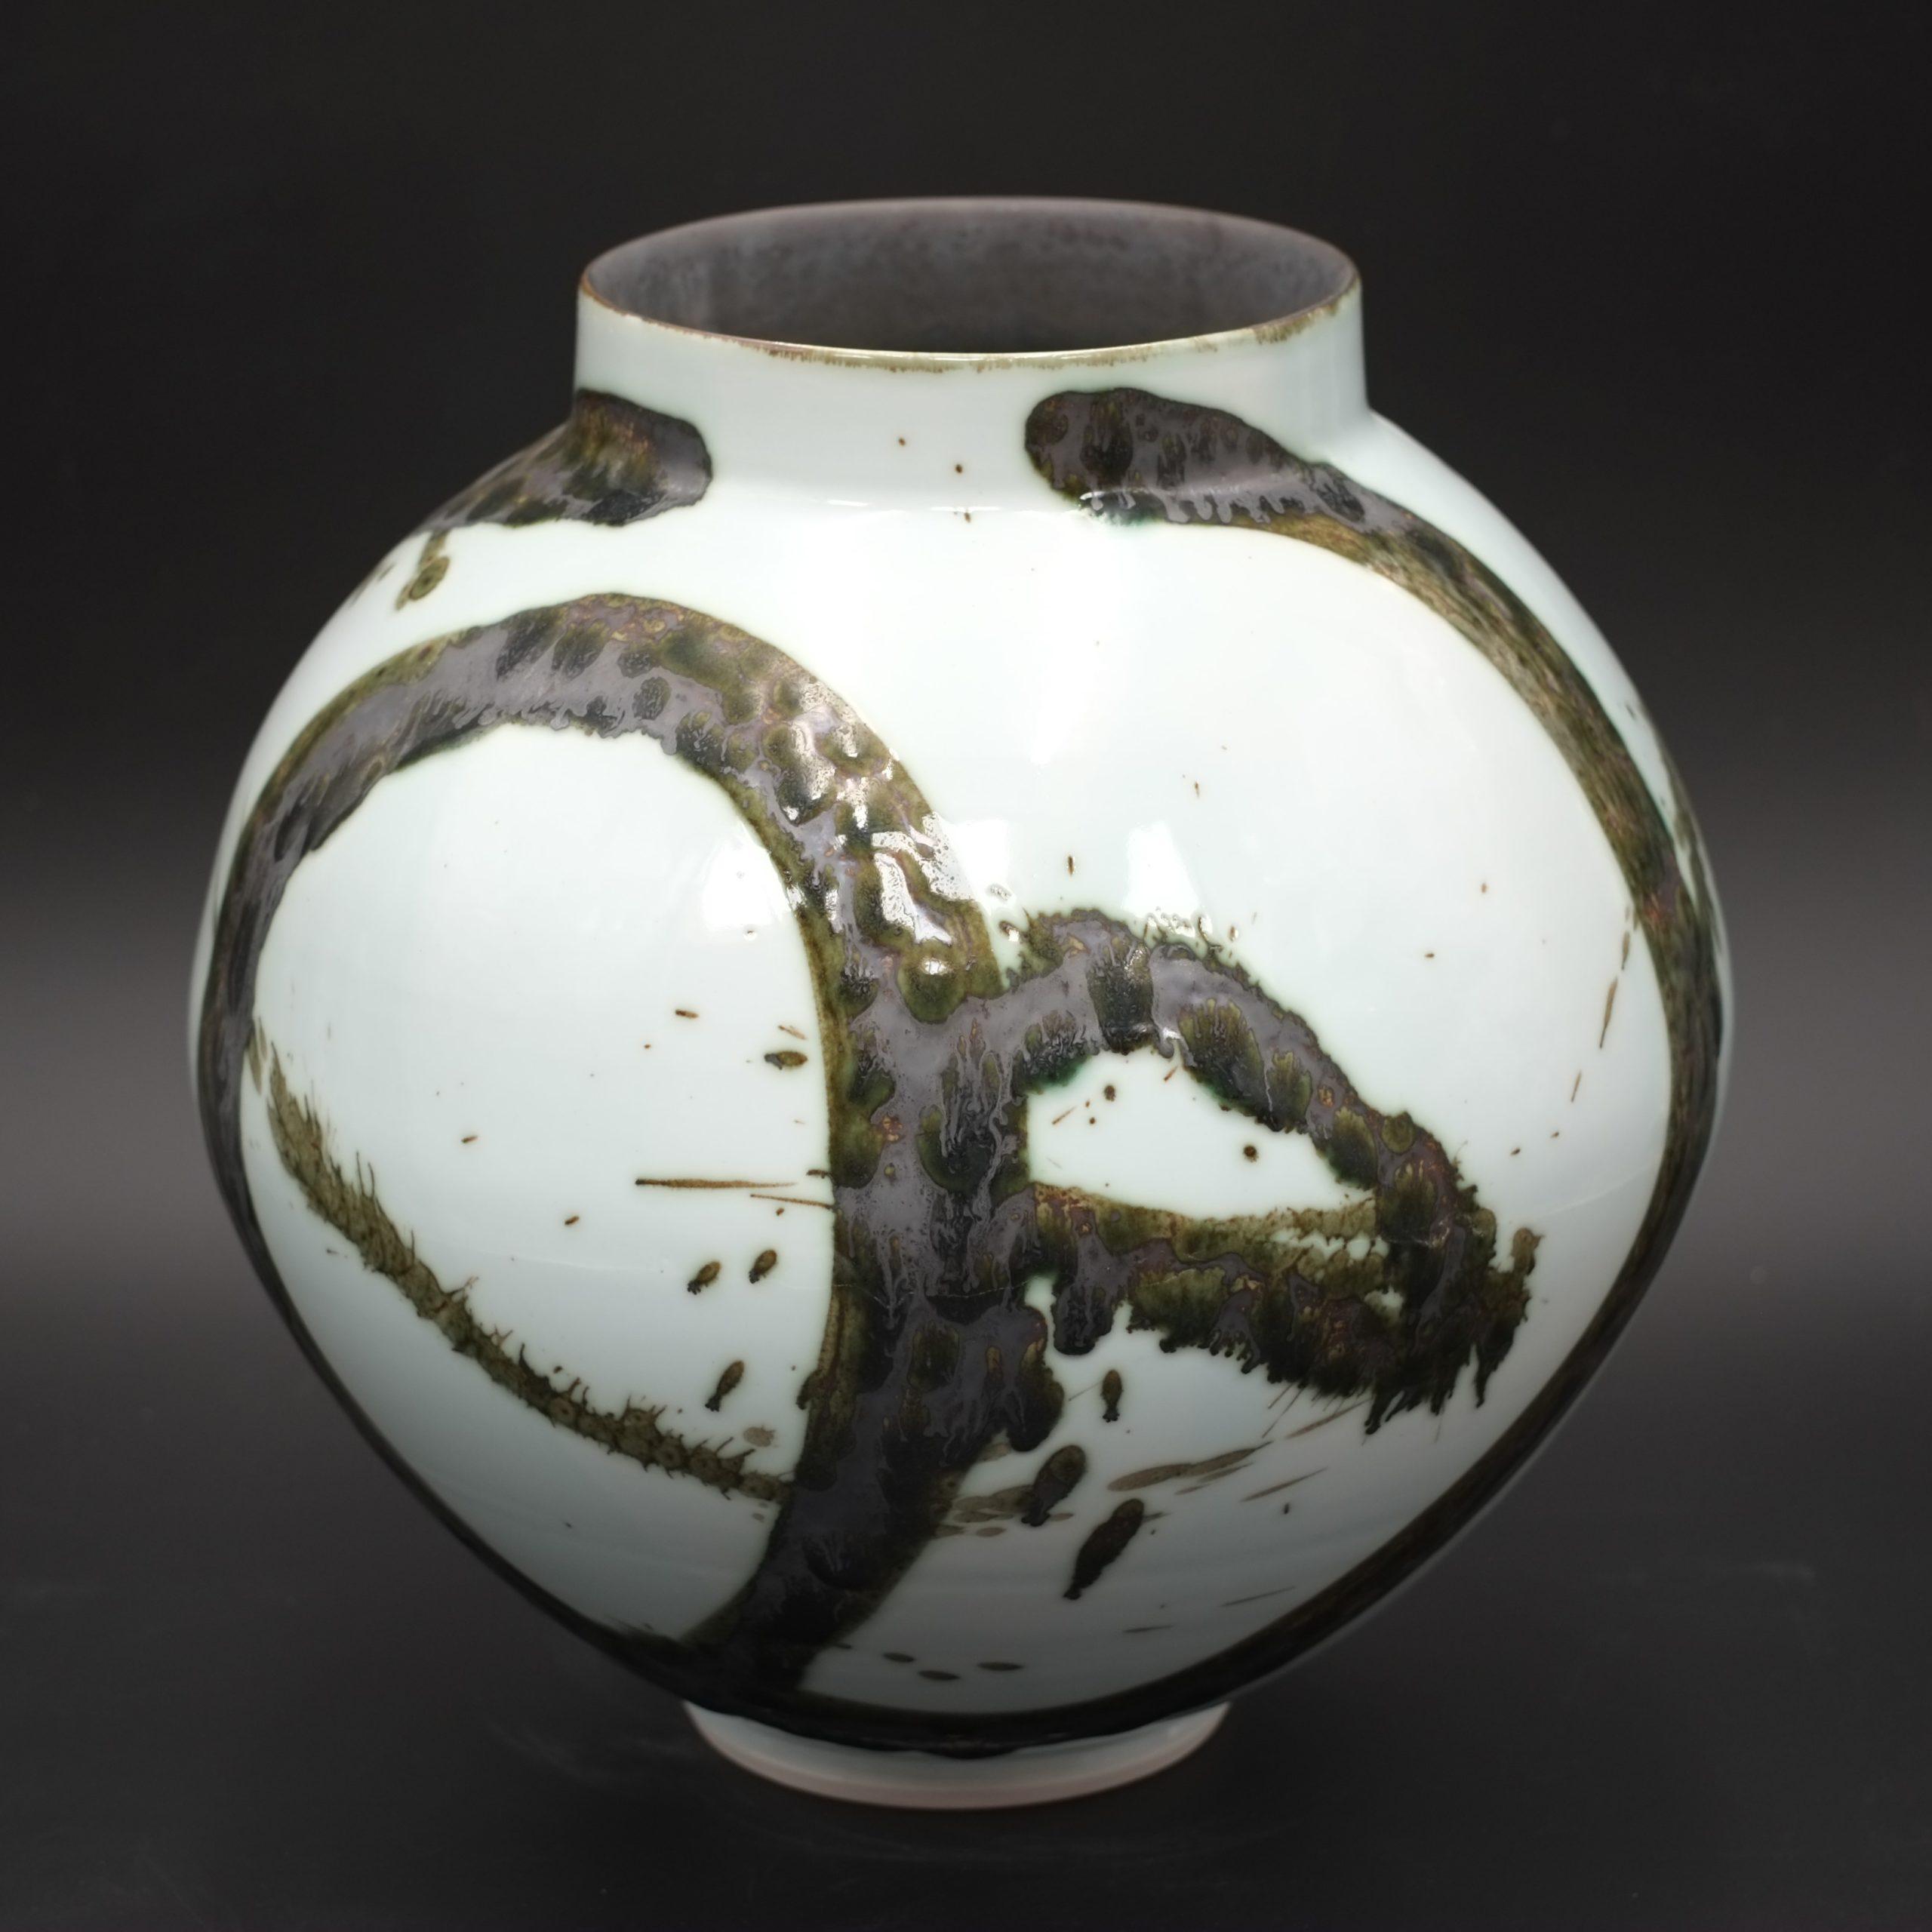 Tricia Thom. Moon Jar (large)